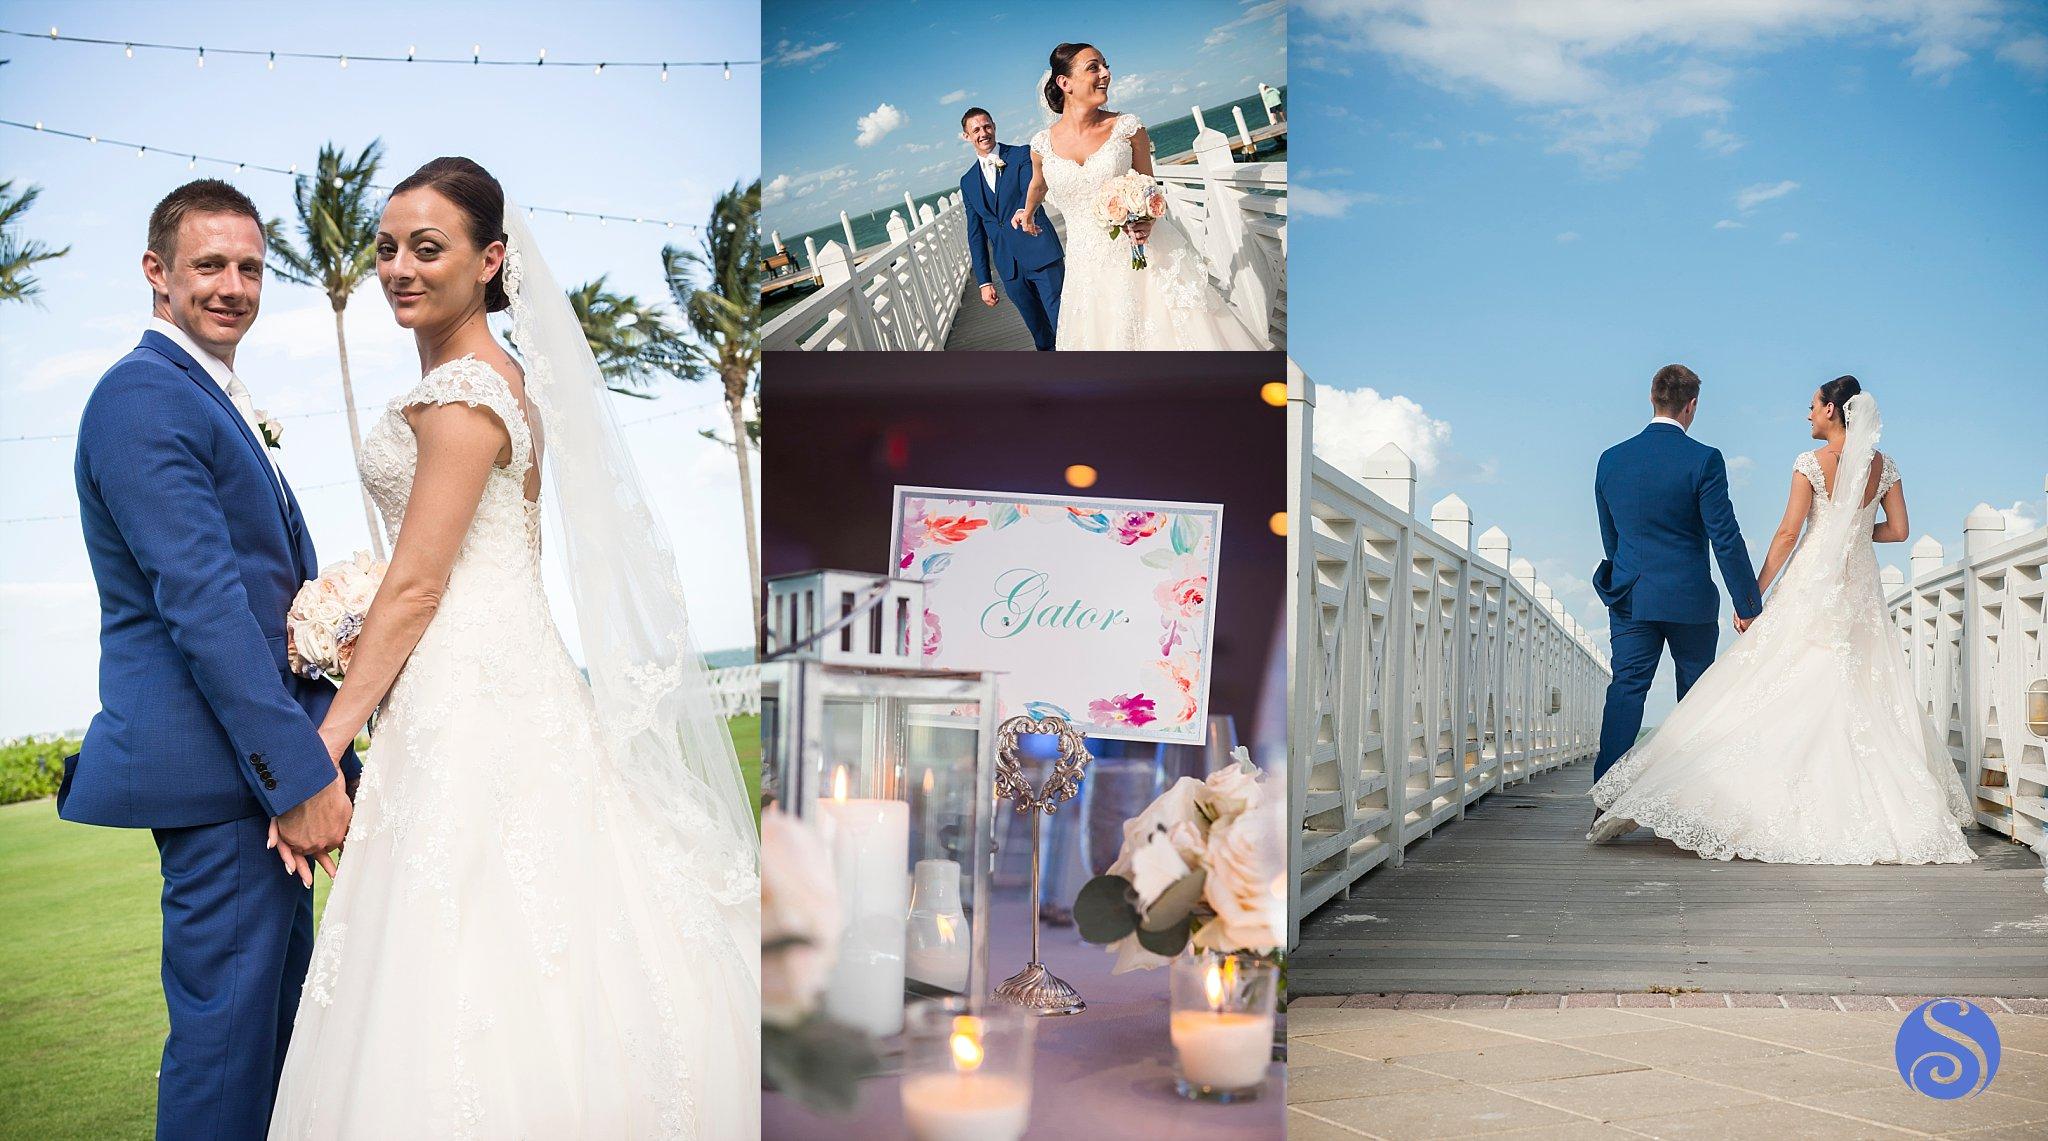 South Seas Island Resort Captiva Florida Wedding Photography